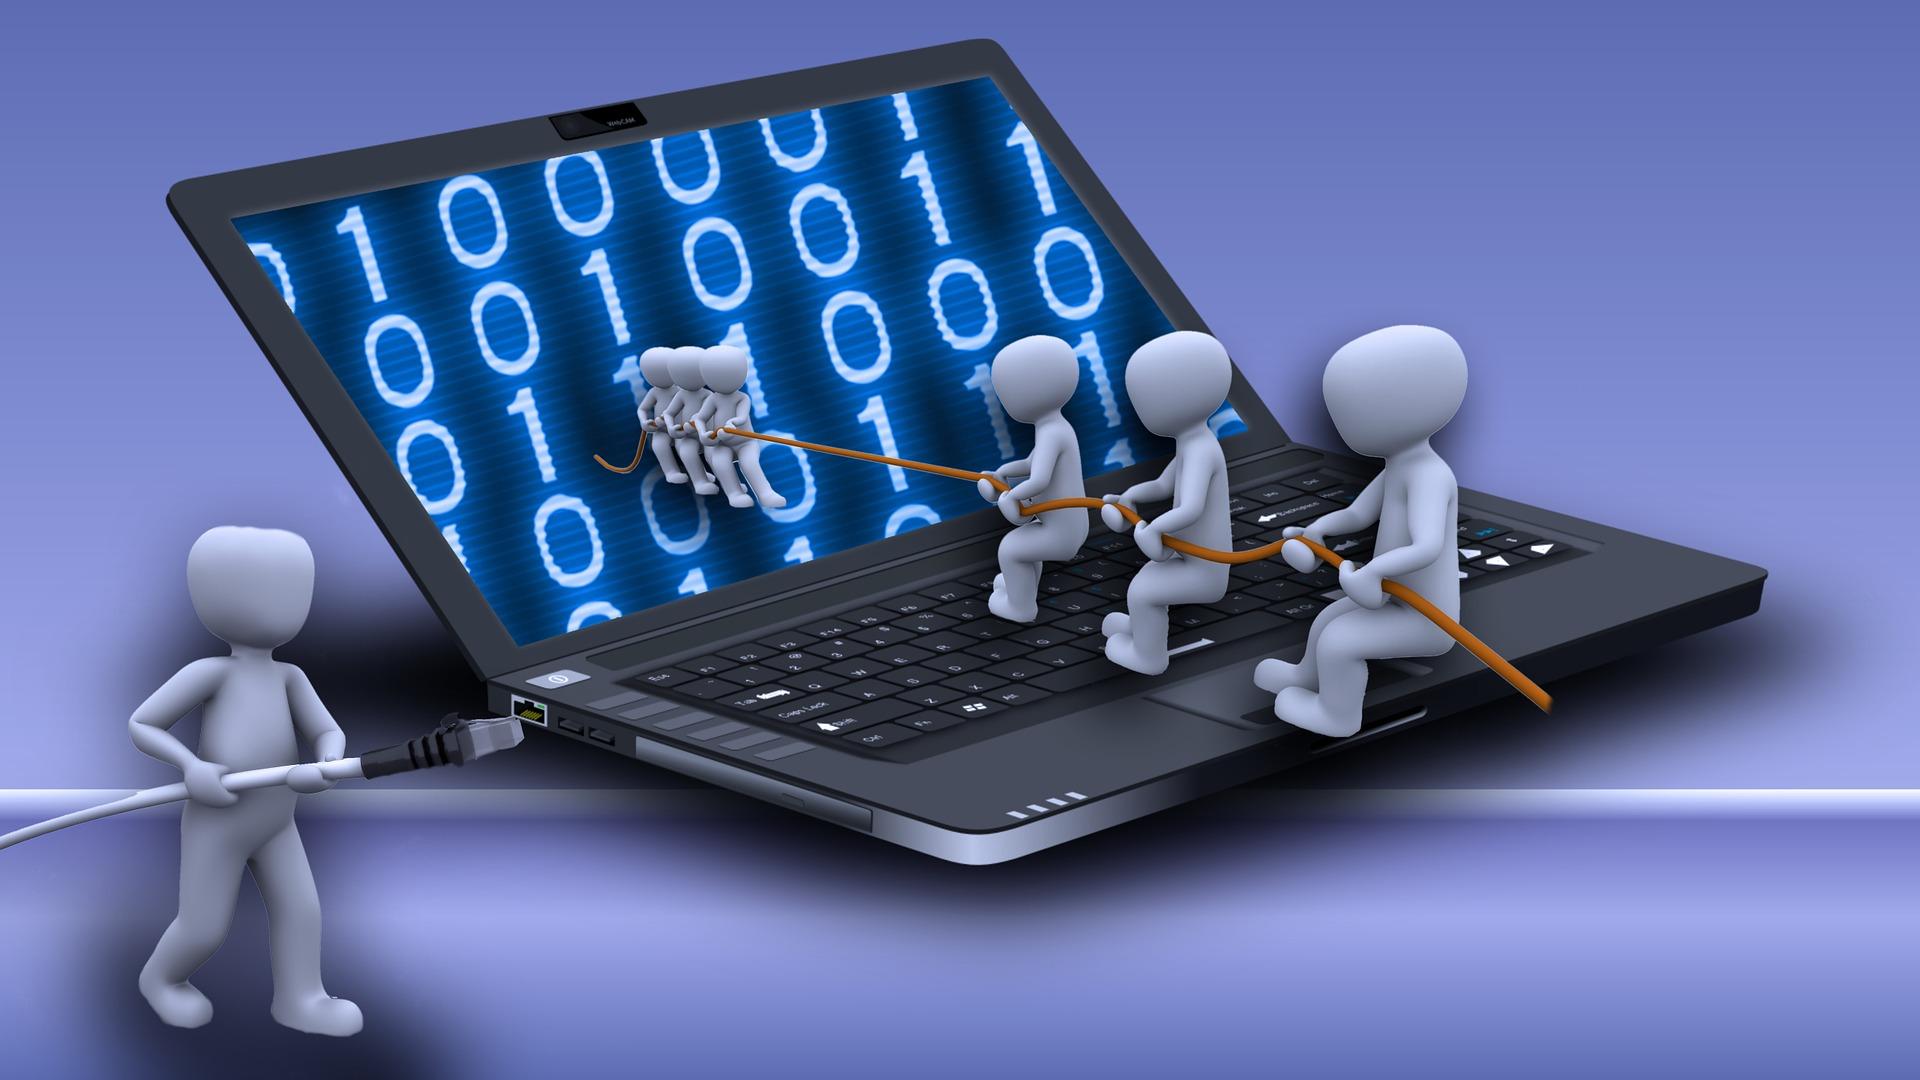 laptop-1104066_1920jpg